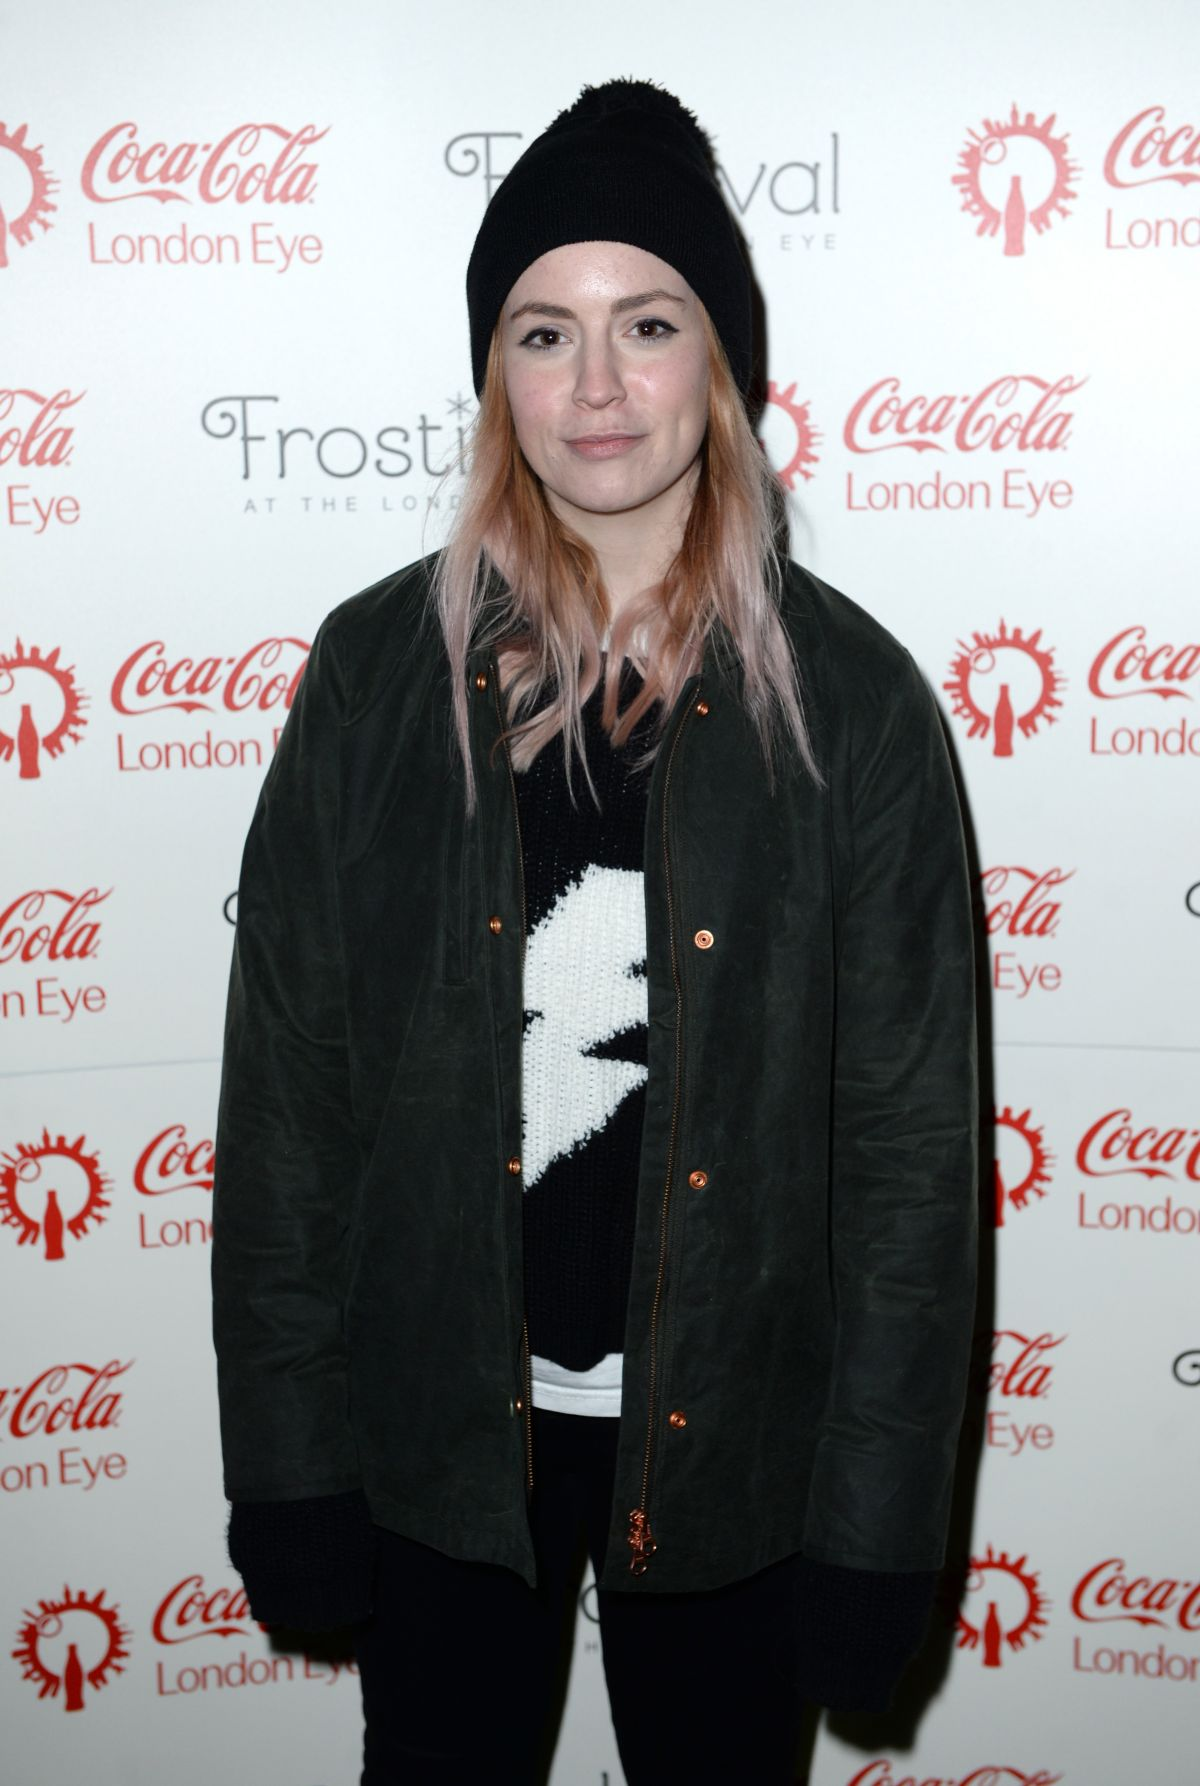 GEMMA STYLES at Coca Cola London Eye Frostival Eyeskate in London 11/18/2015